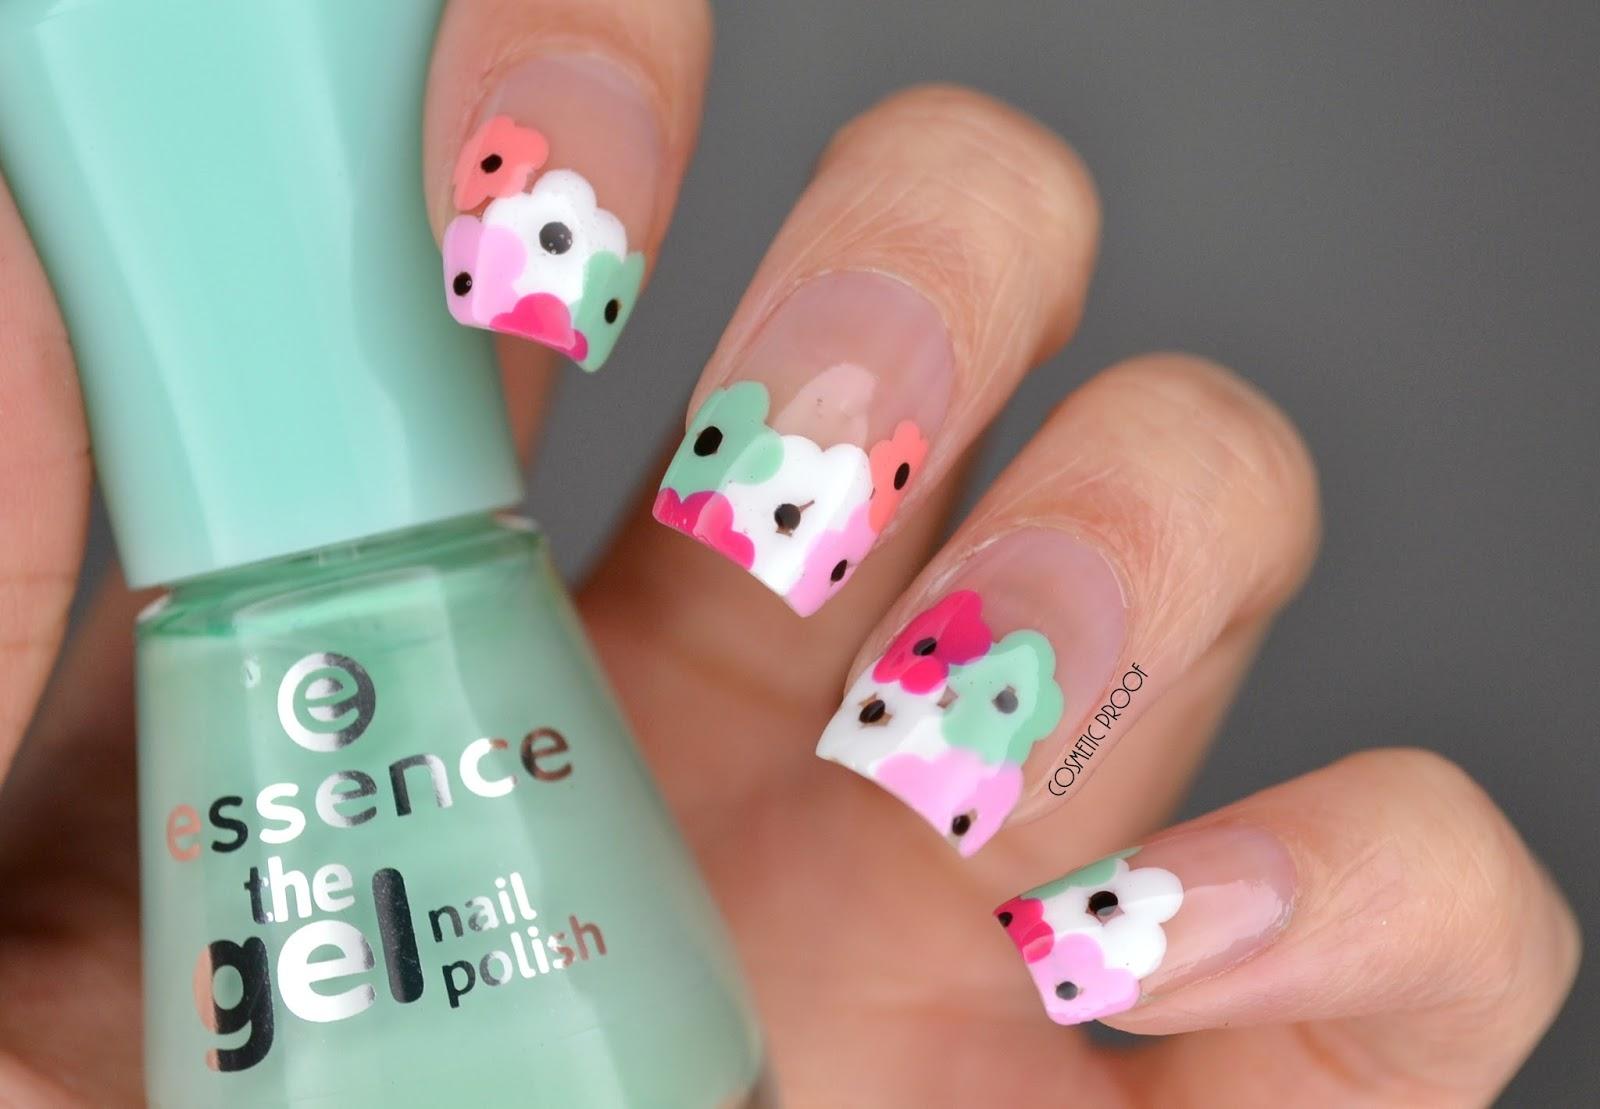 Nails negative space flowers manimonday cosmetic proof negative space flower nail art izmirmasajfo